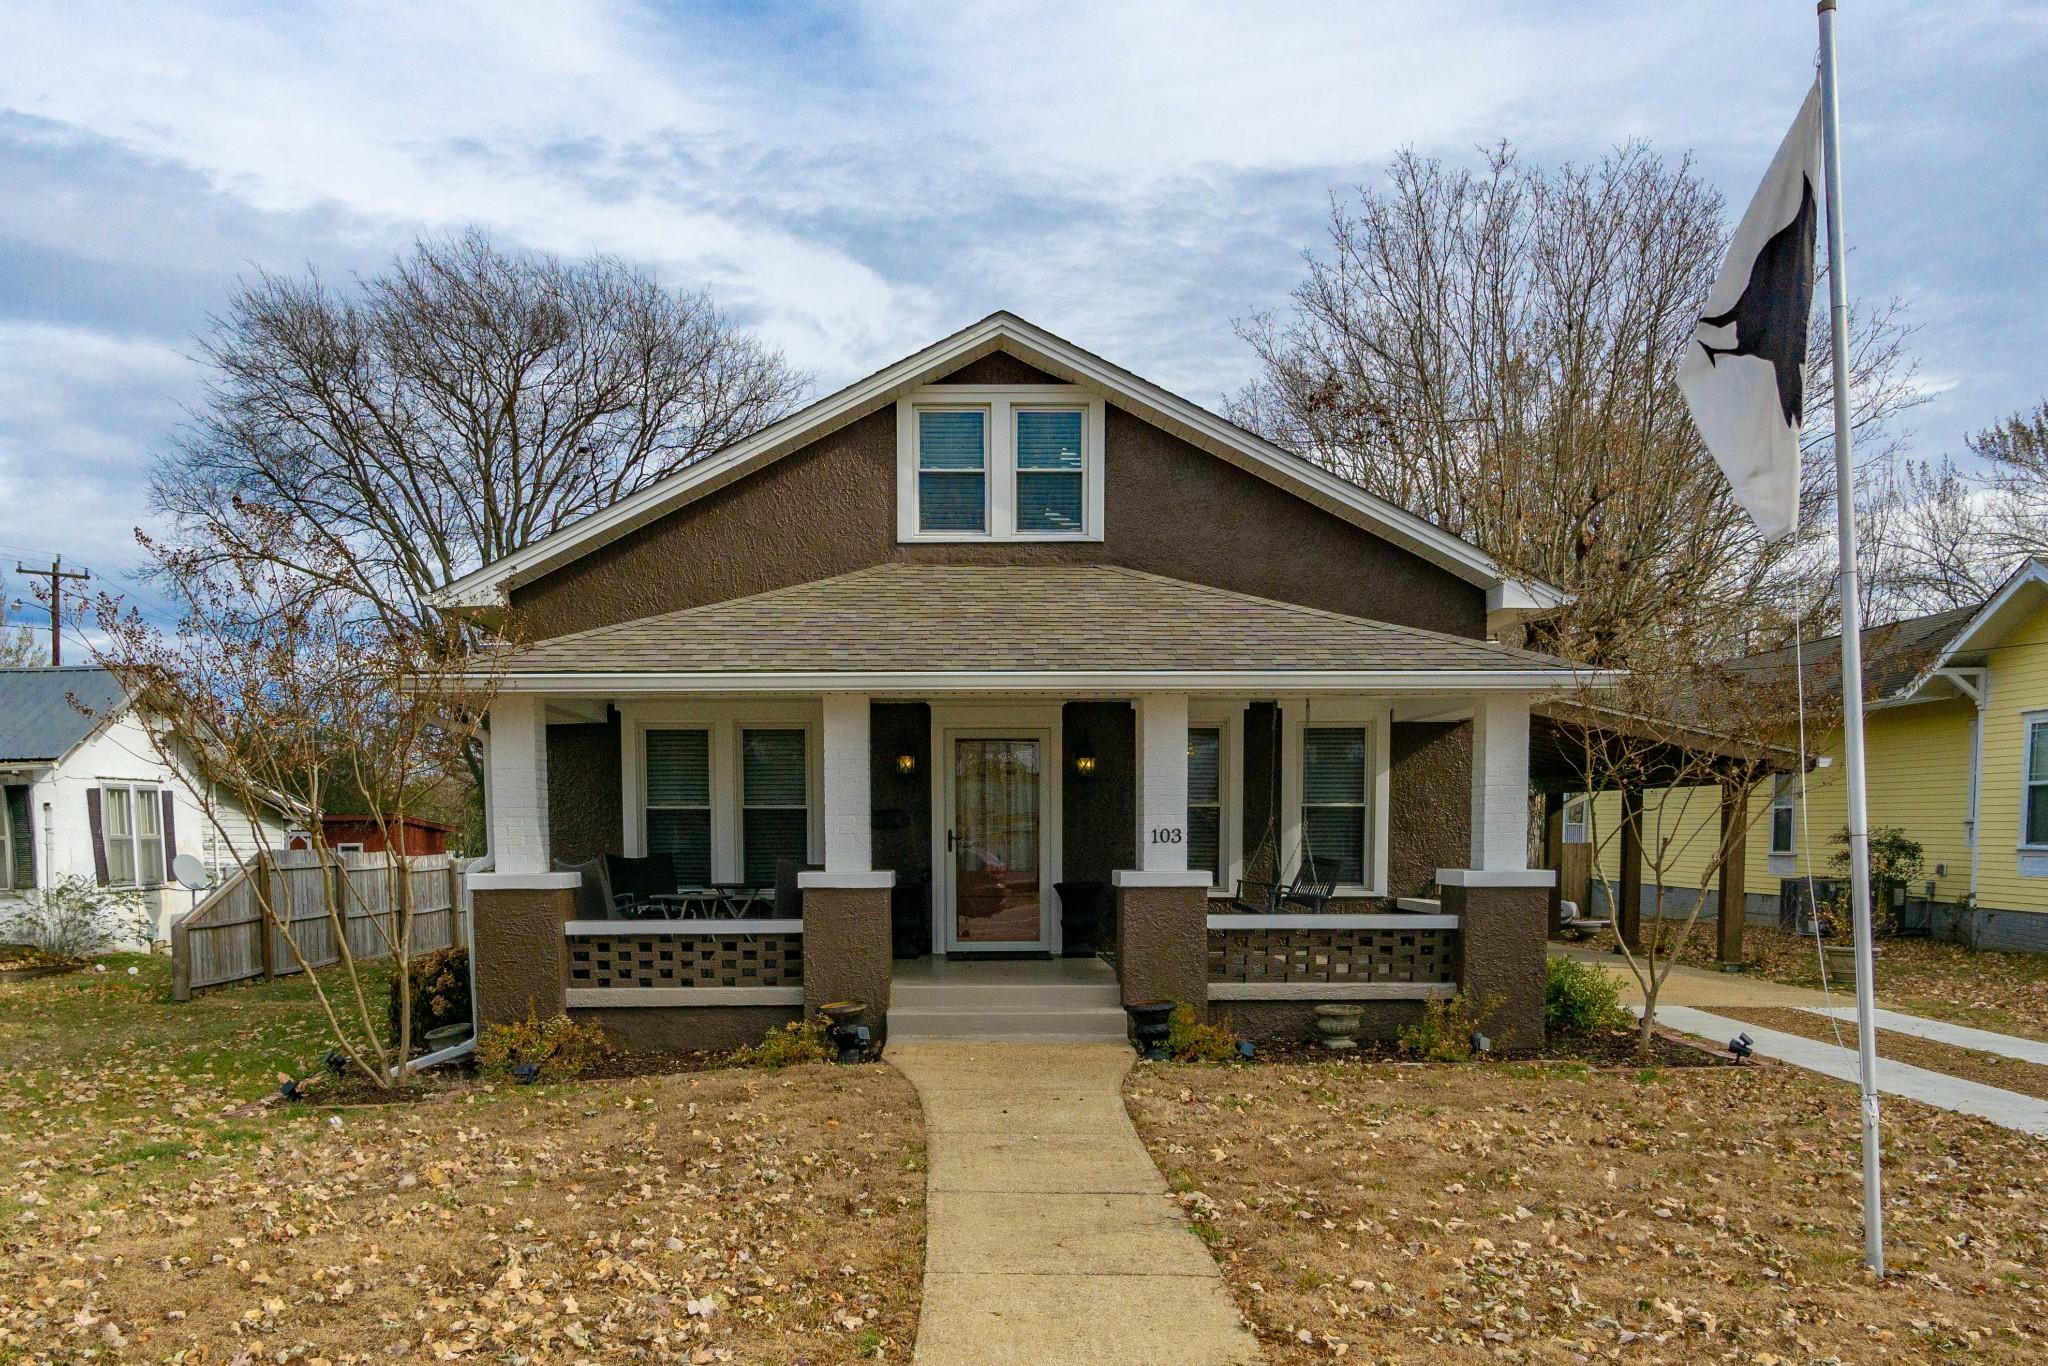 103 S Park St, Hohenwald, TN 38462 - Hohenwald, TN real estate listing